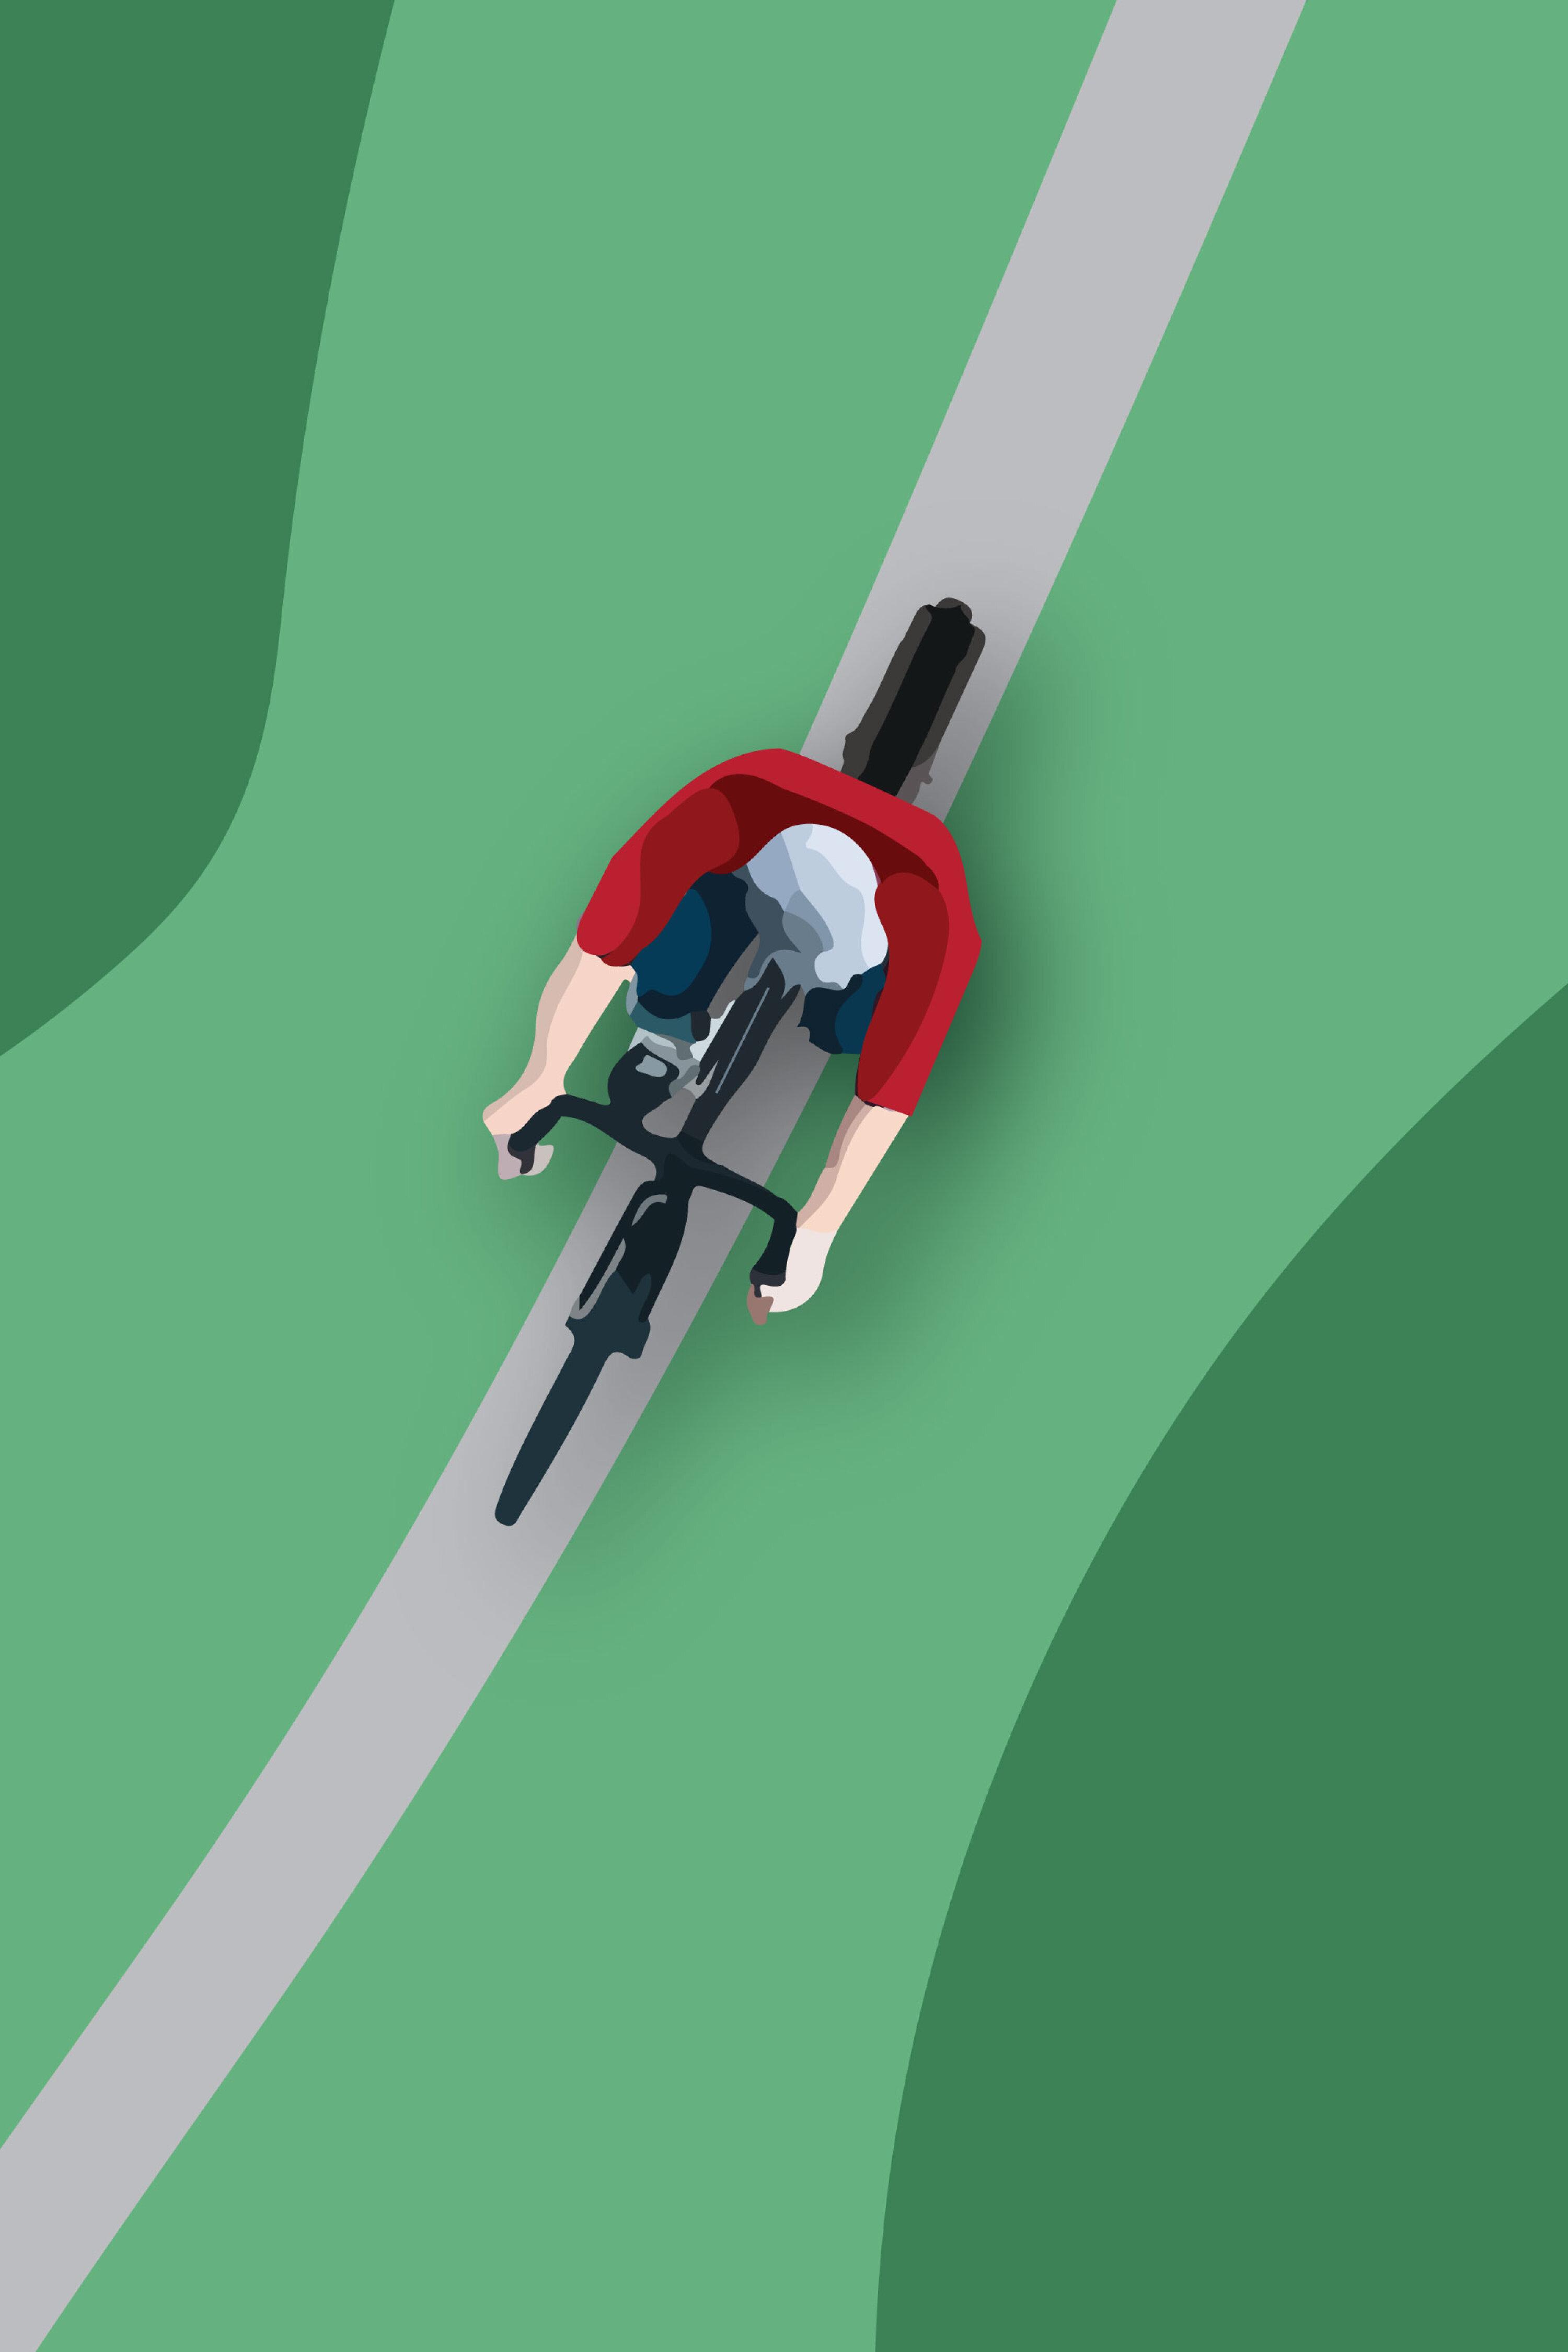 PRO_PD_fietser_staand